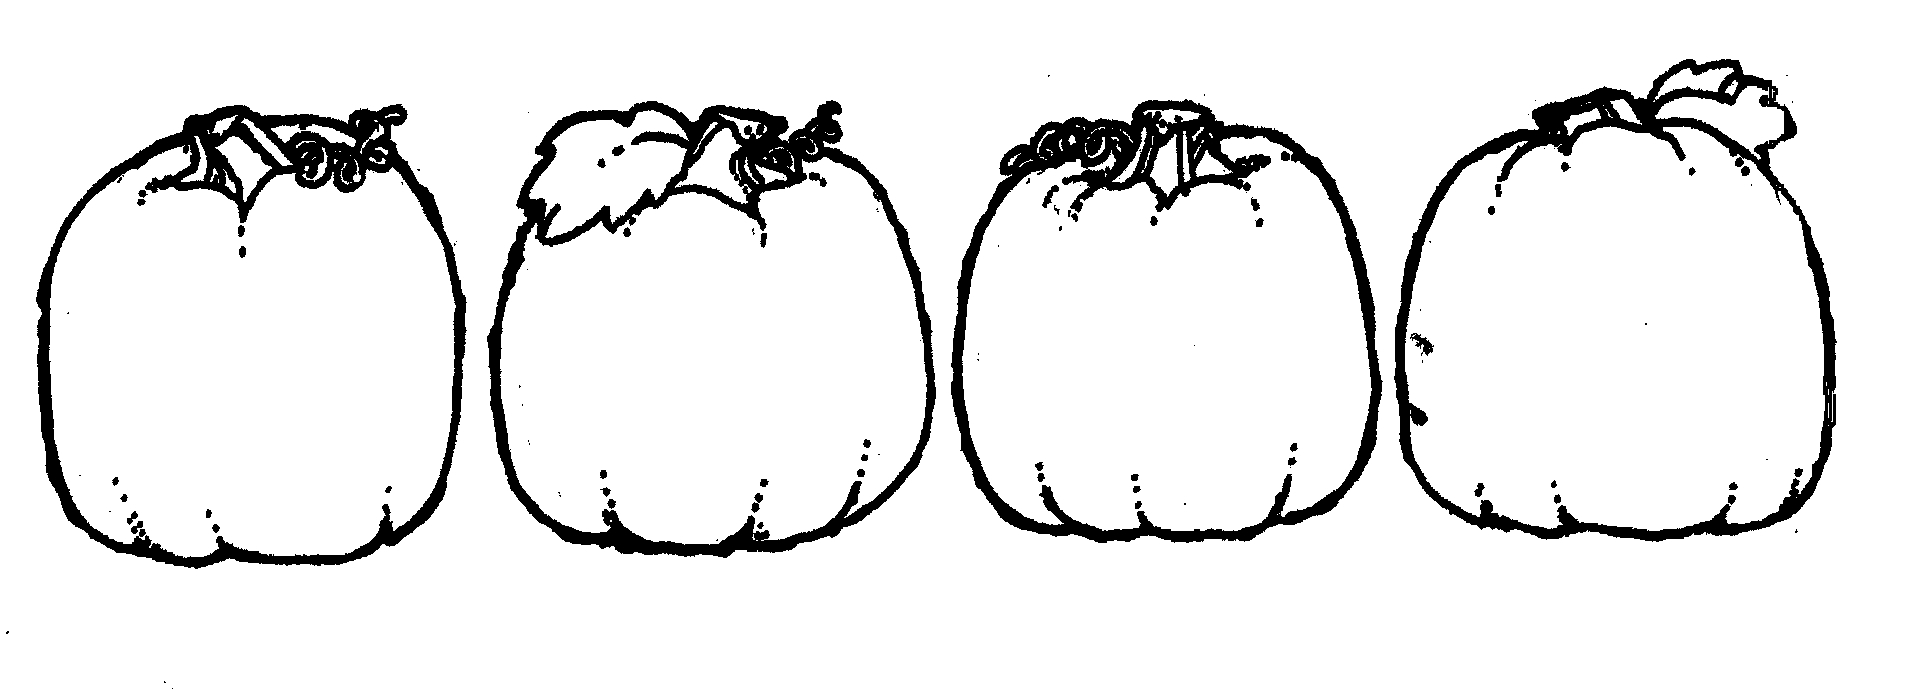 1920x689 Best Pumpkin Clipart Black And White